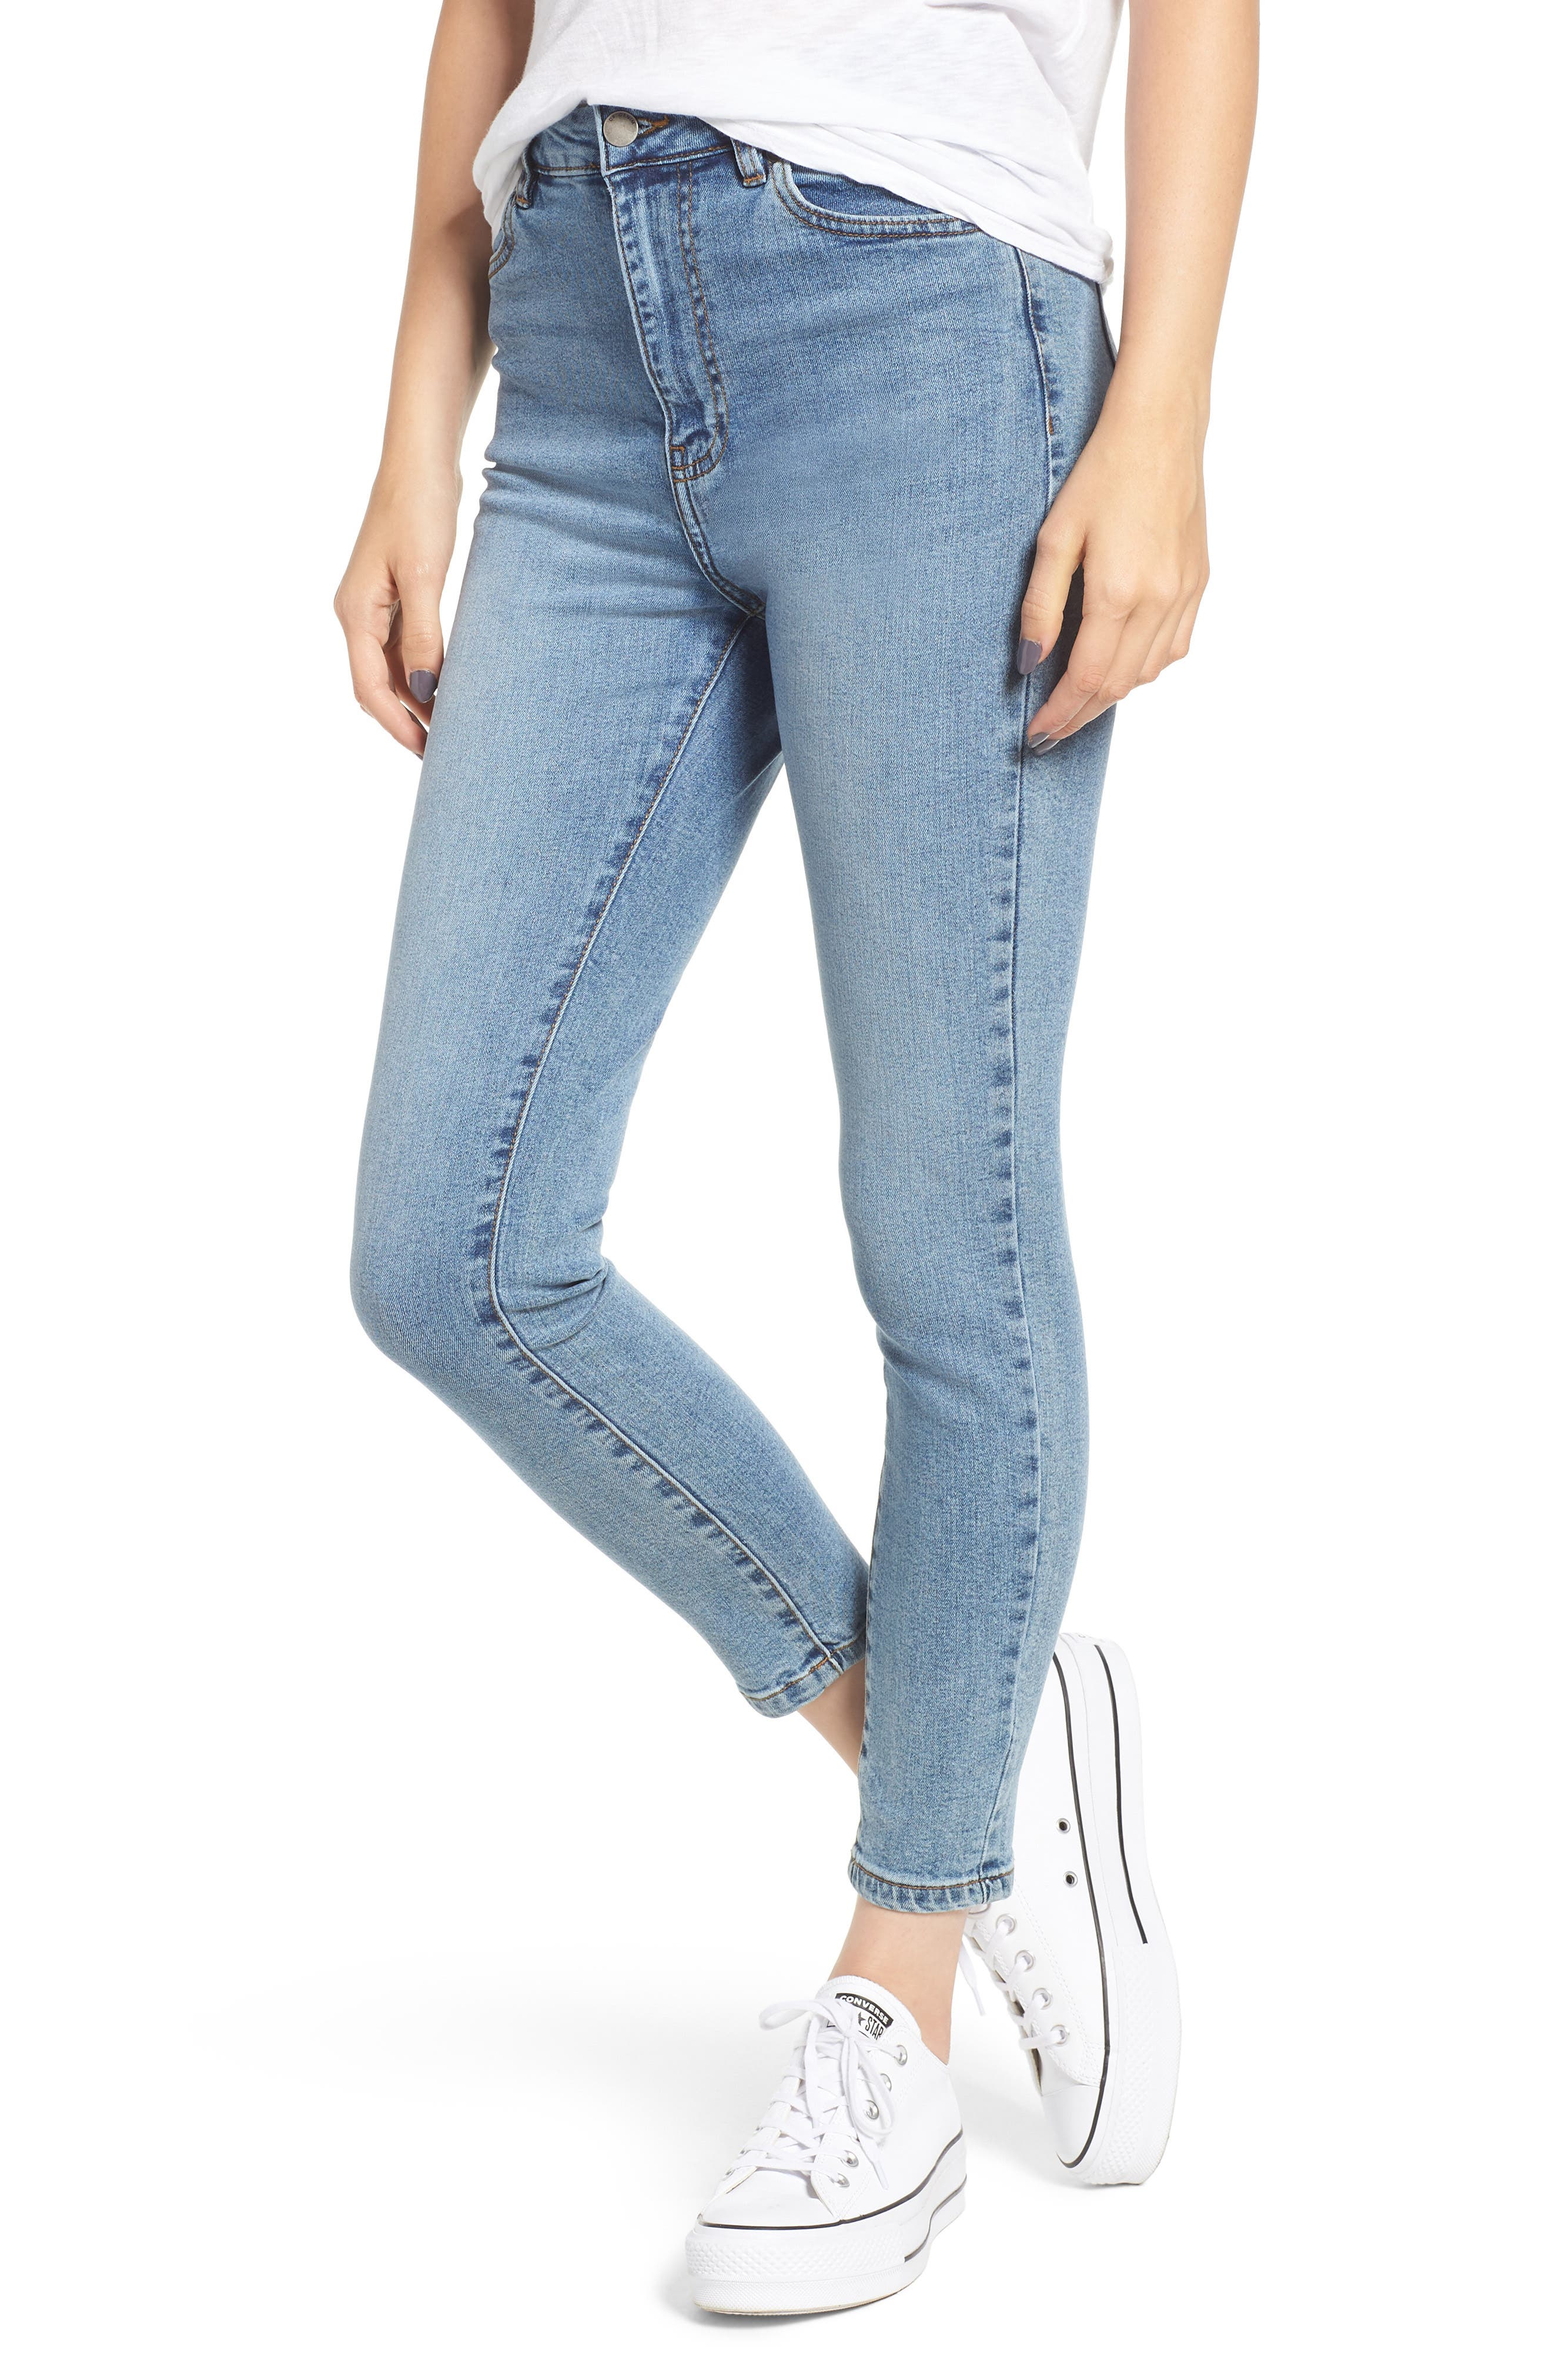 DR. DENIM SUPPLY CO. Copacabana Crop Skinny Jeans, Main, color, 400